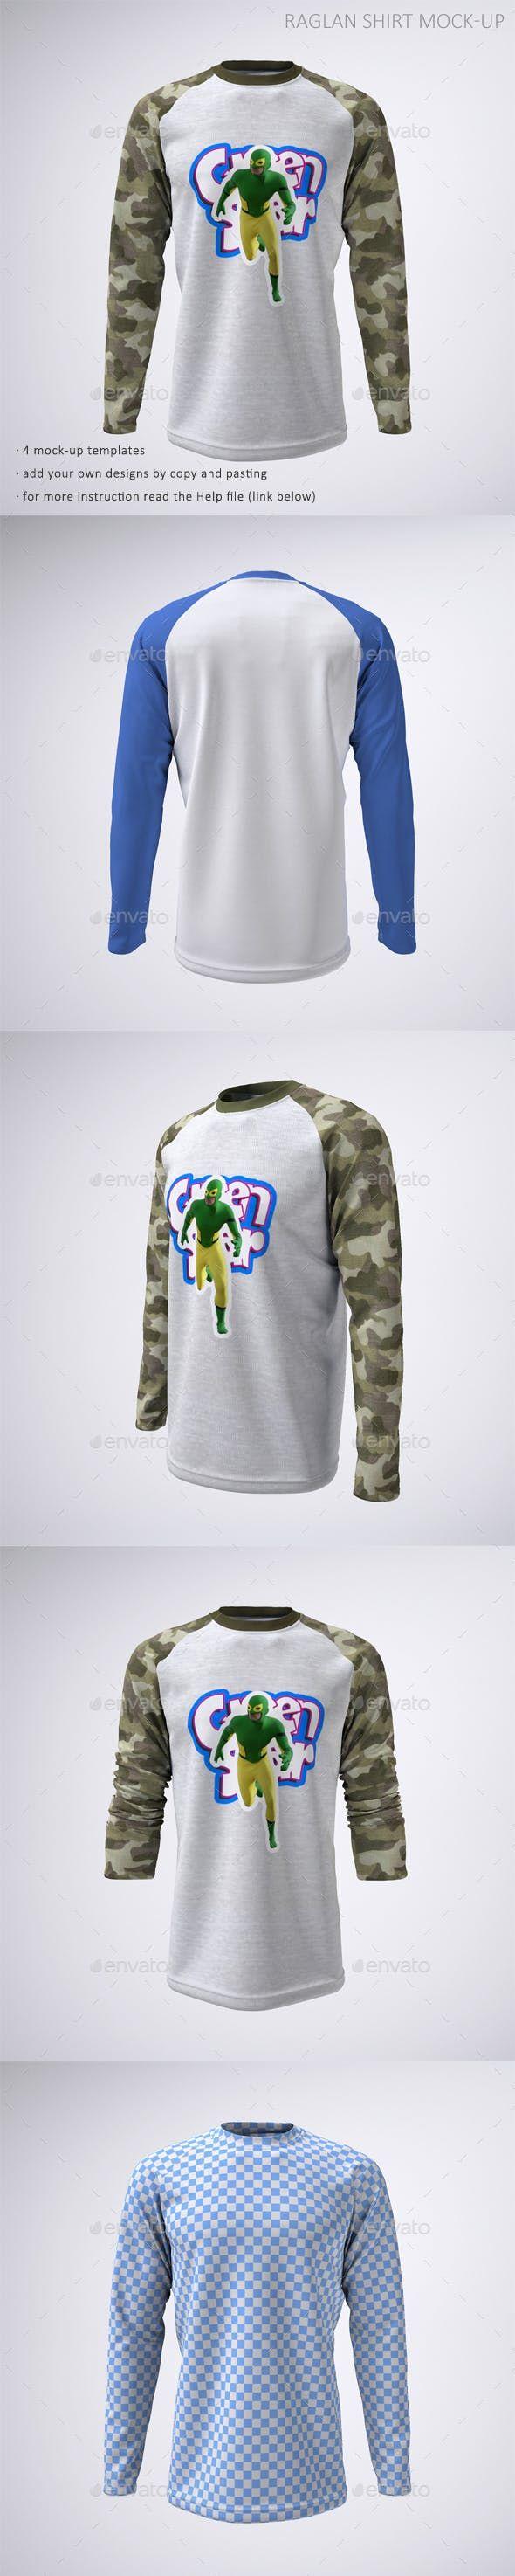 Download Long Sleeve Raglan Or Baseball T Shirt Mock Up Clothing Mockup Fashion Design Logo Clothing Fashion Logo Design